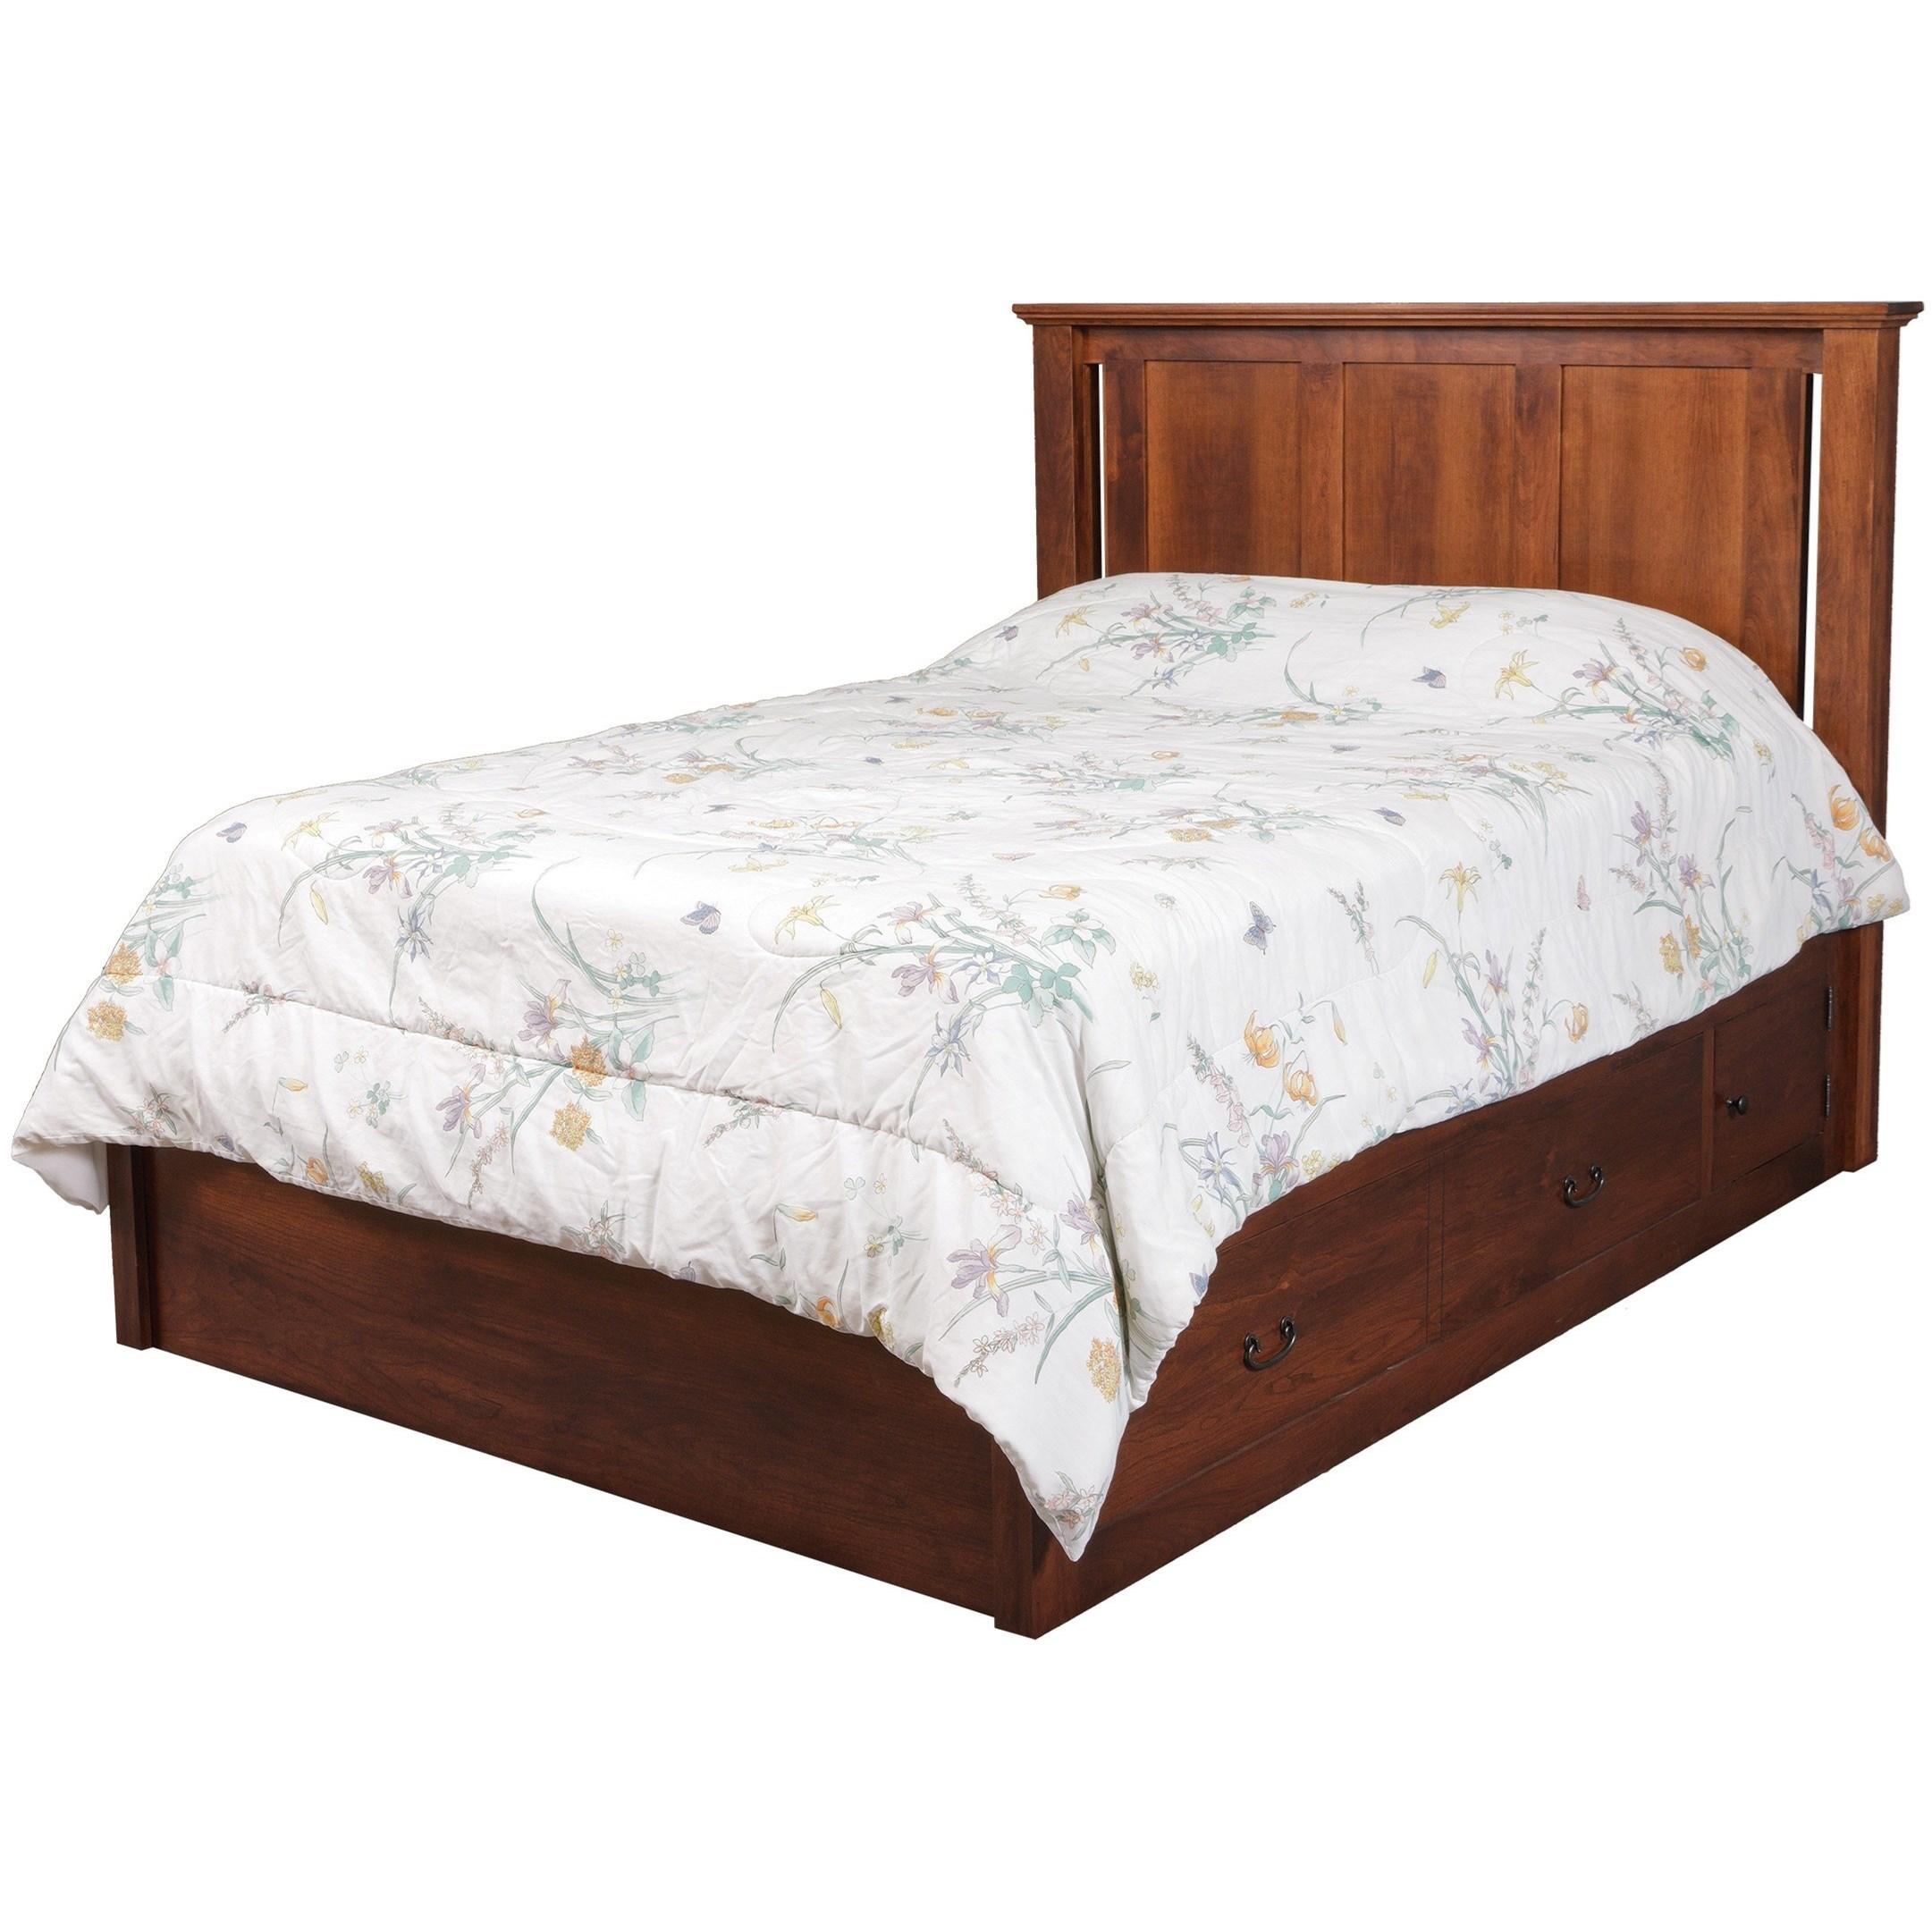 Elegance Queen Pedestal Bed by Daniel's Amish at Saugerties Furniture Mart